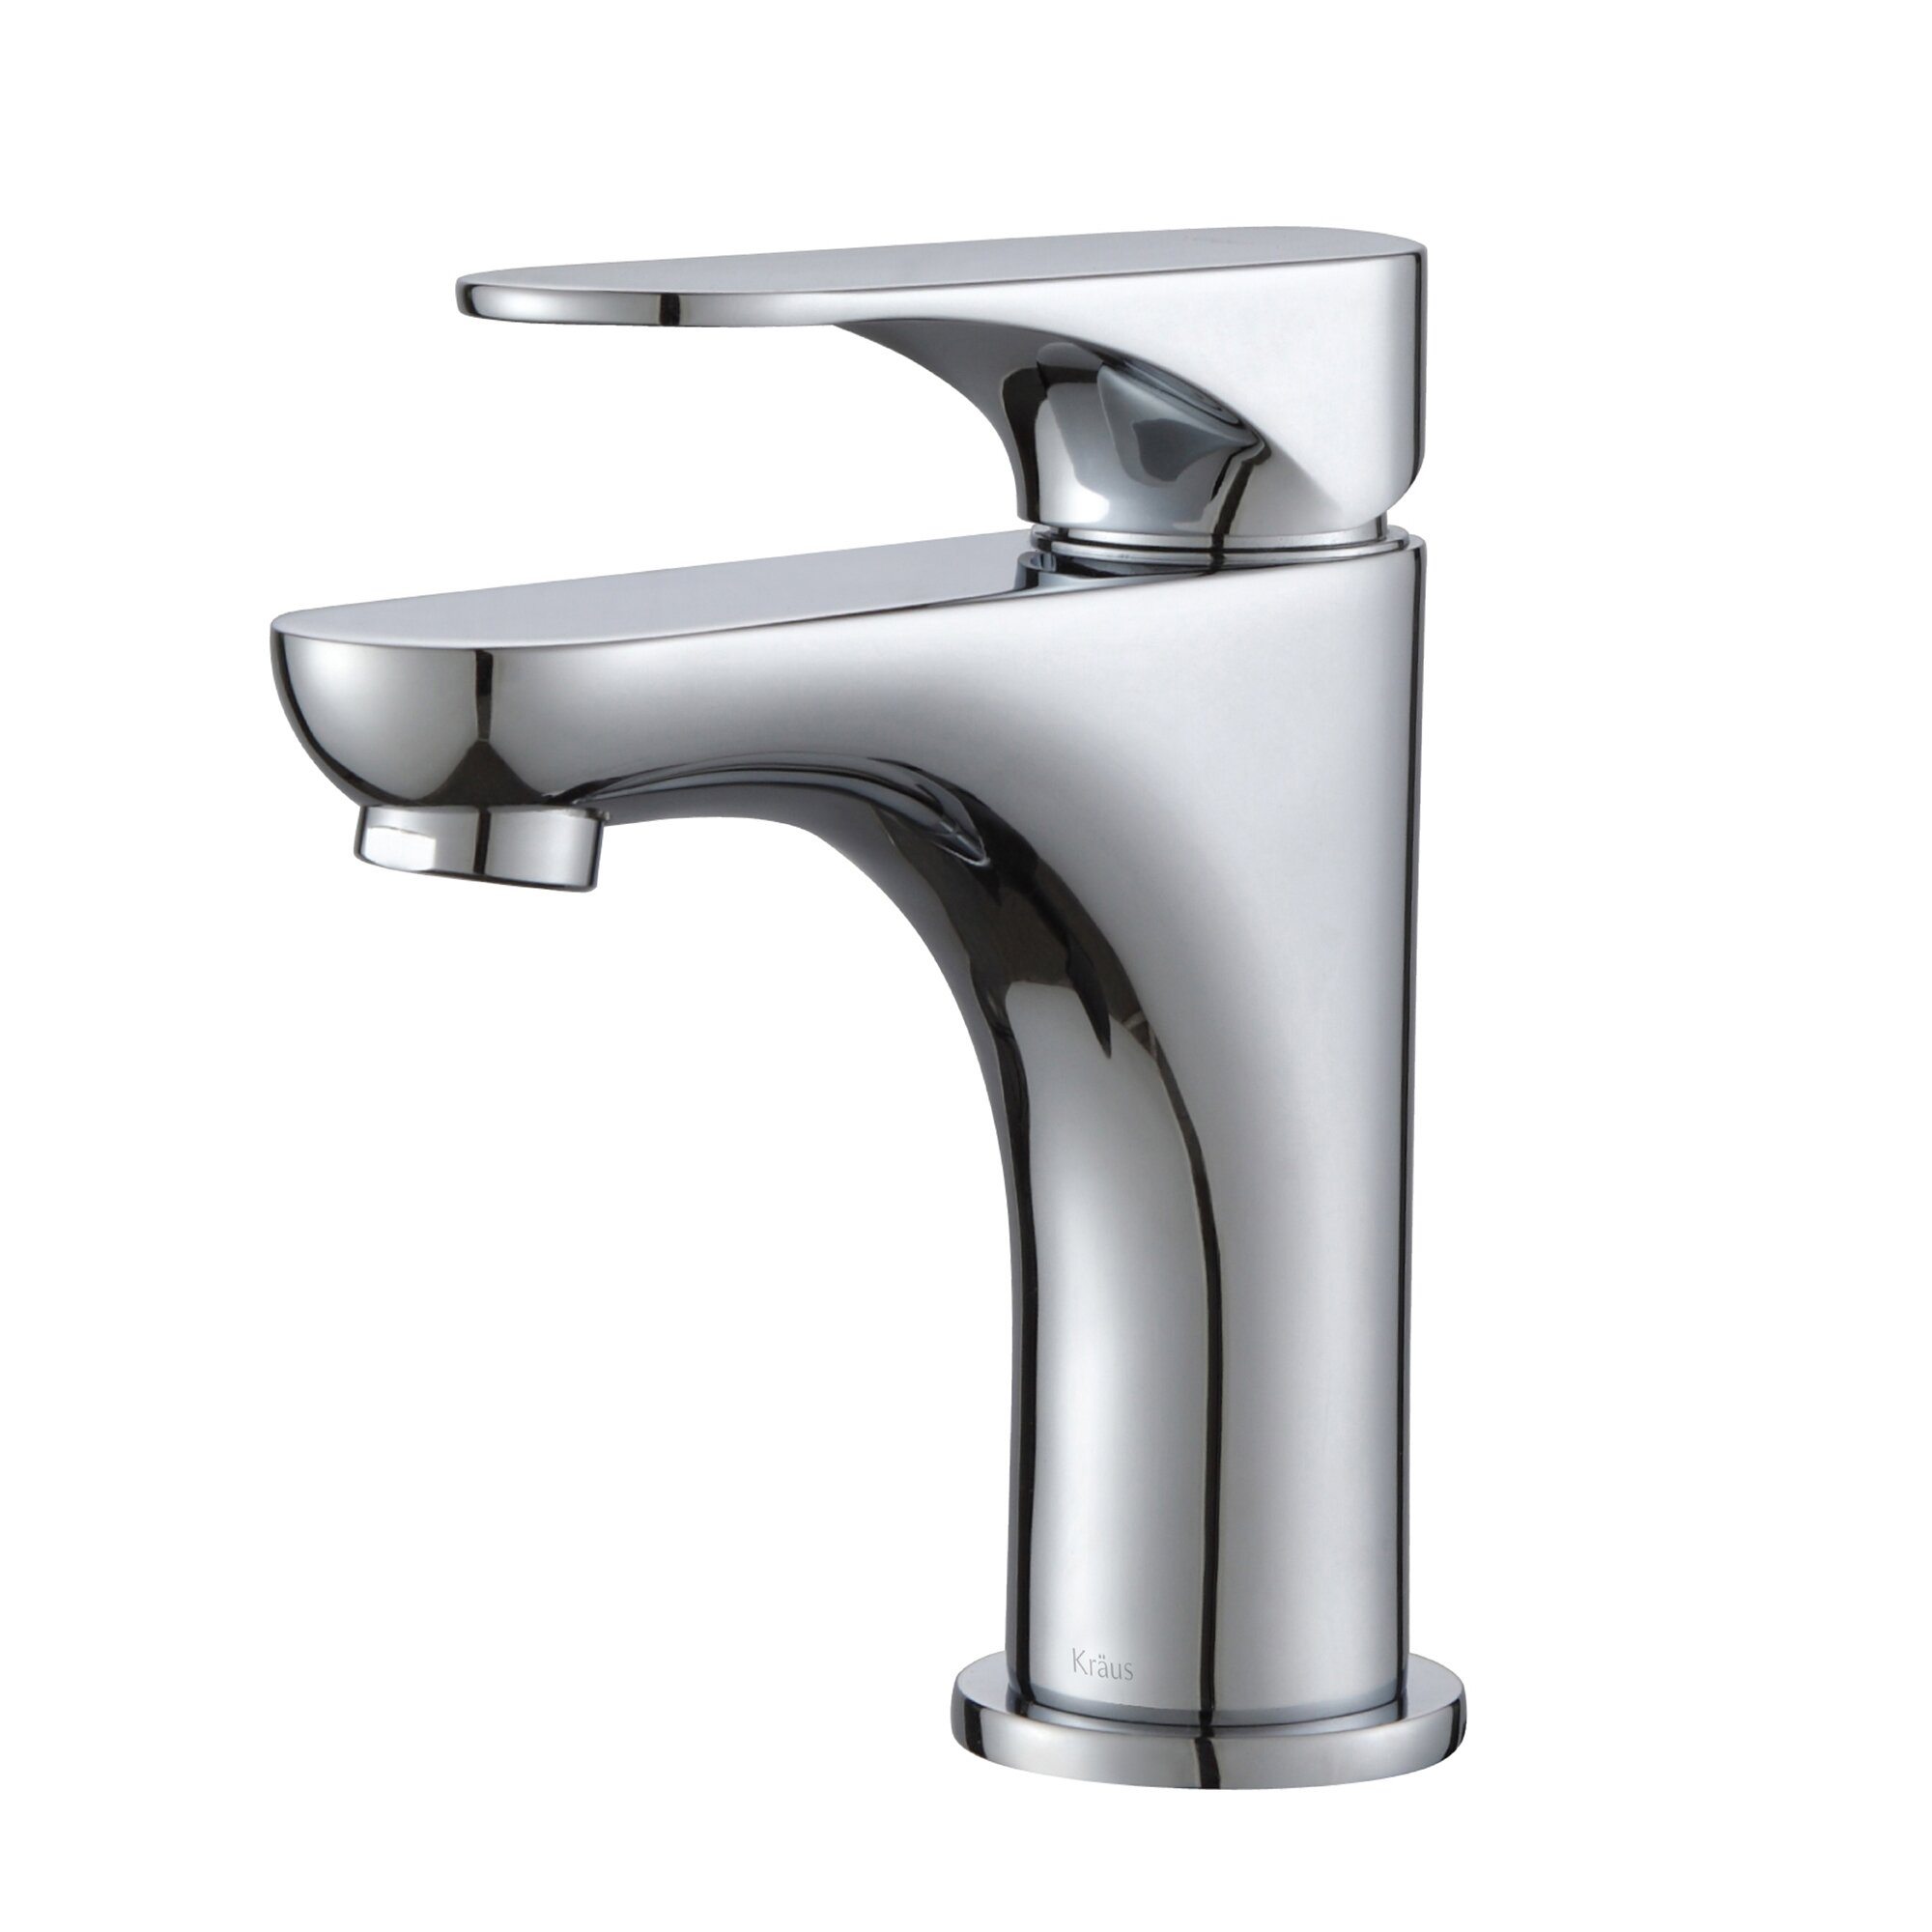 Kraus aquila single handle bathroom faucet reviews wayfair - Kraus shower faucets ...